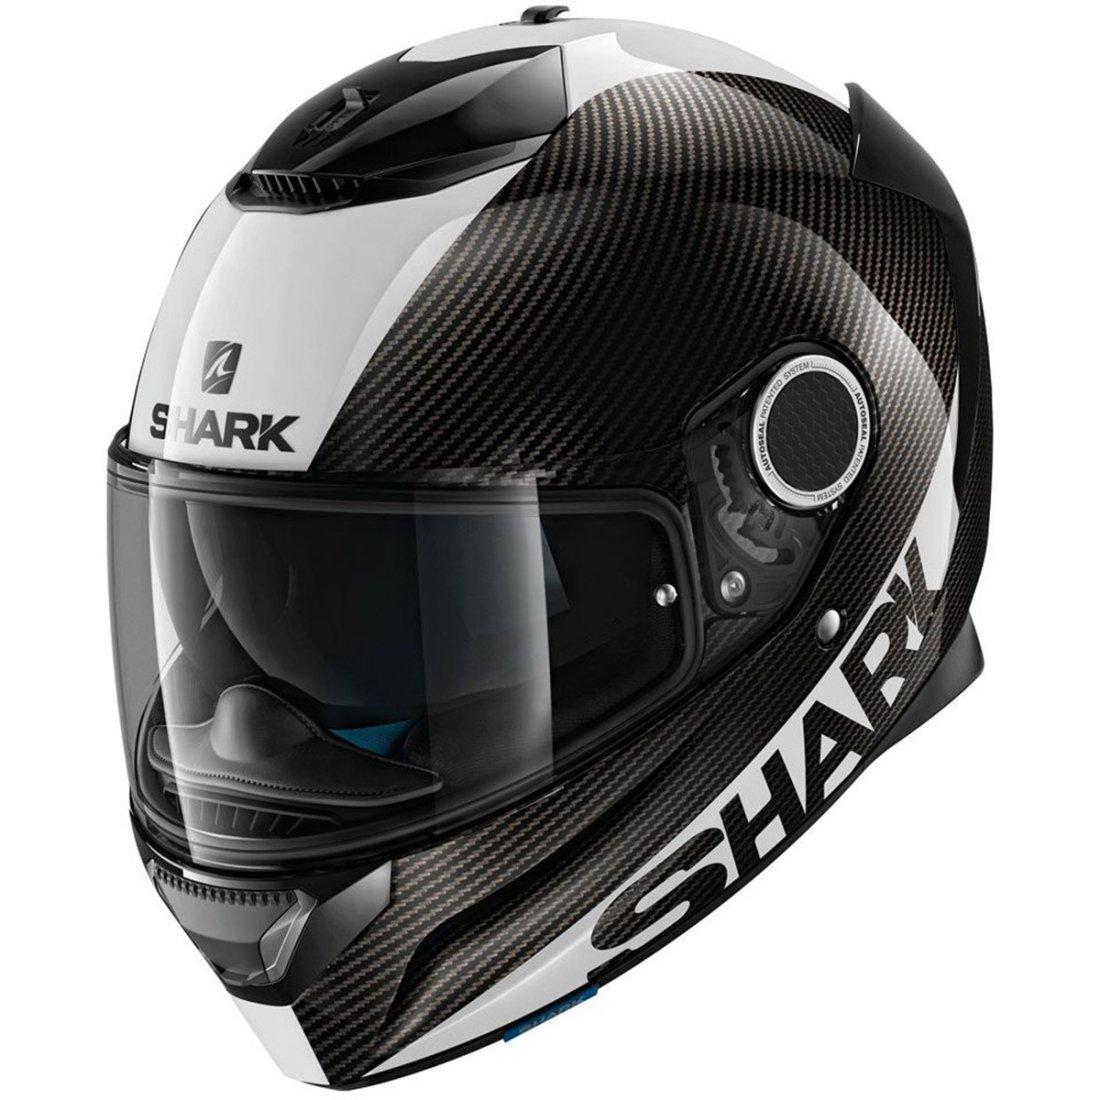 Shark Spartan Carbon White Helmet Motocard